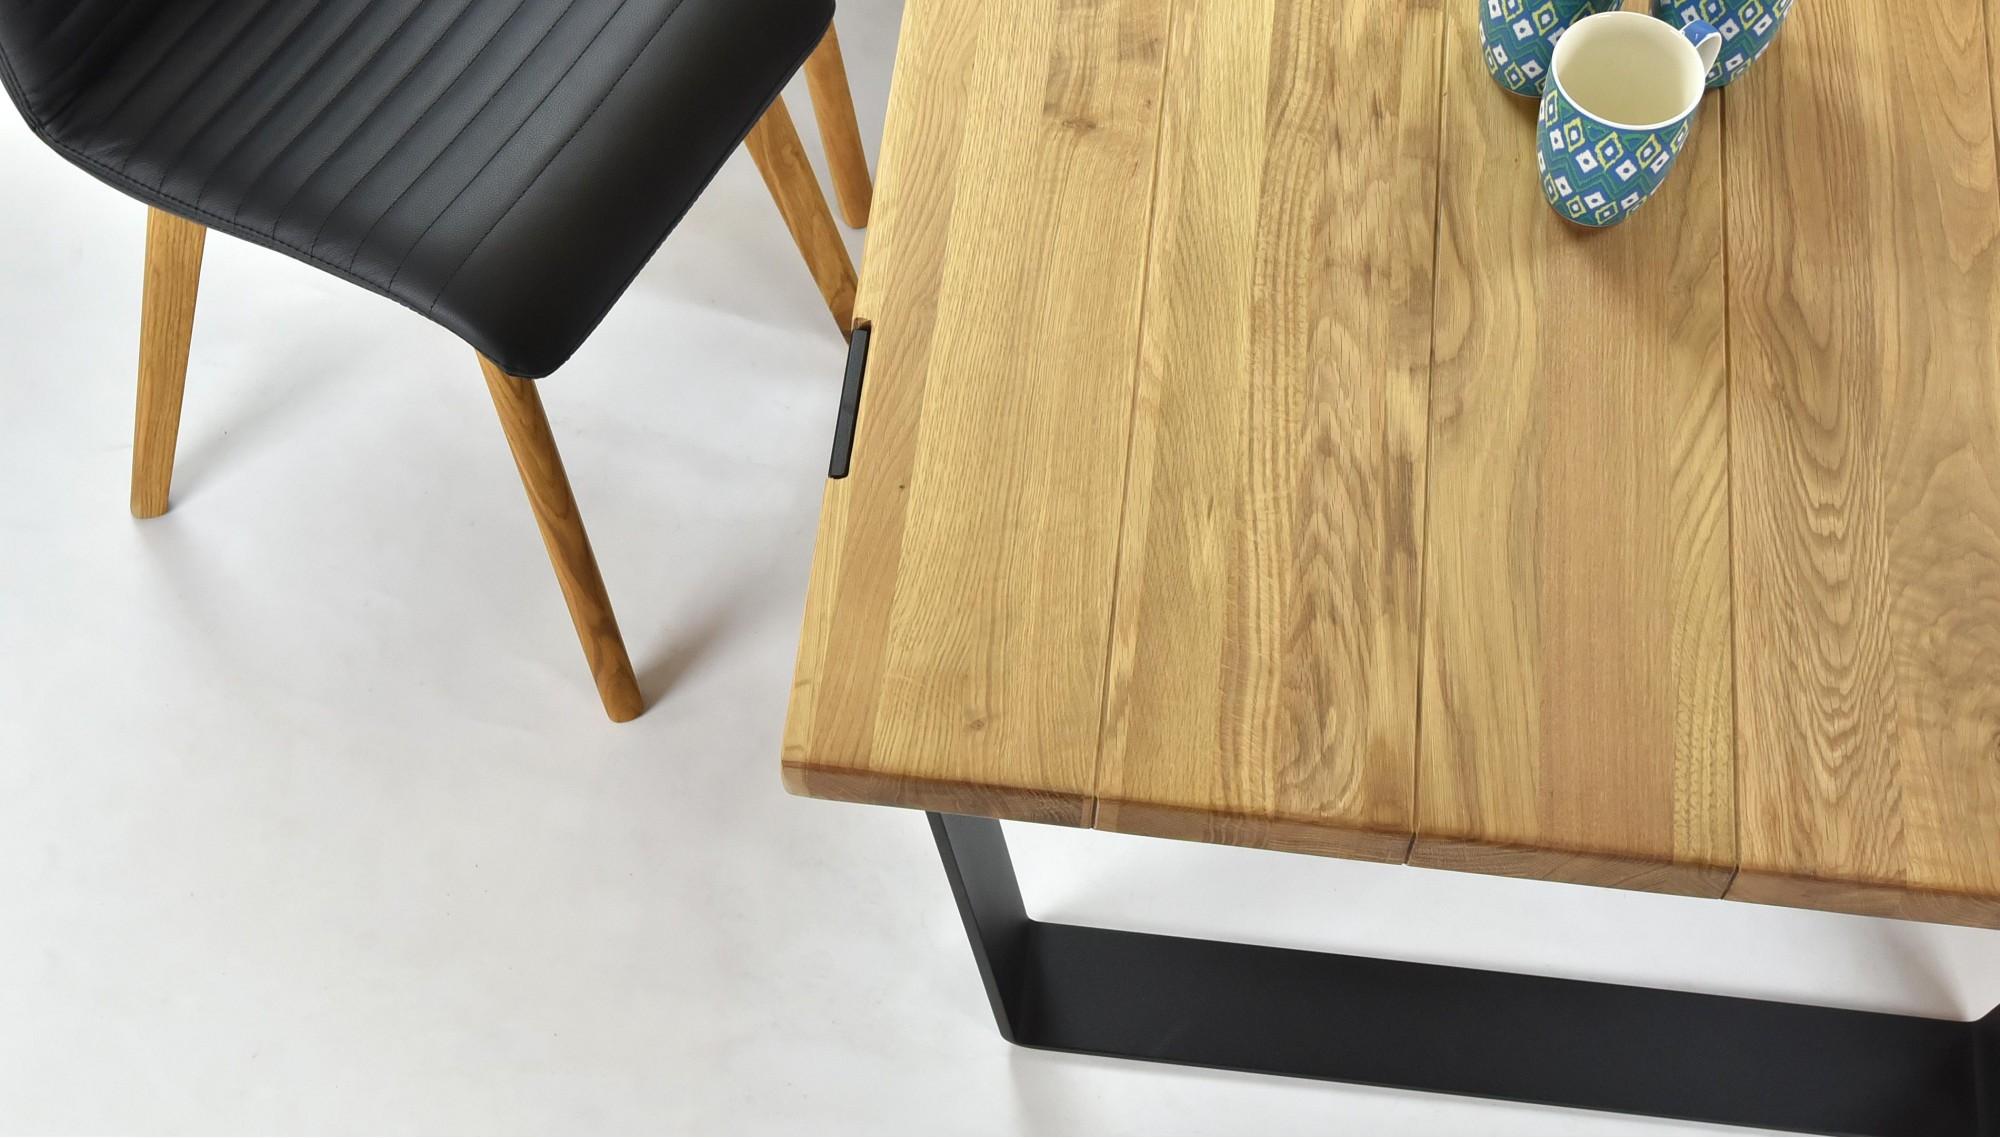 43d7e1ace55d Jedálenský set pre 4-6 osôb (Dubový stôl 180 x 96 a 4 x kožená ...